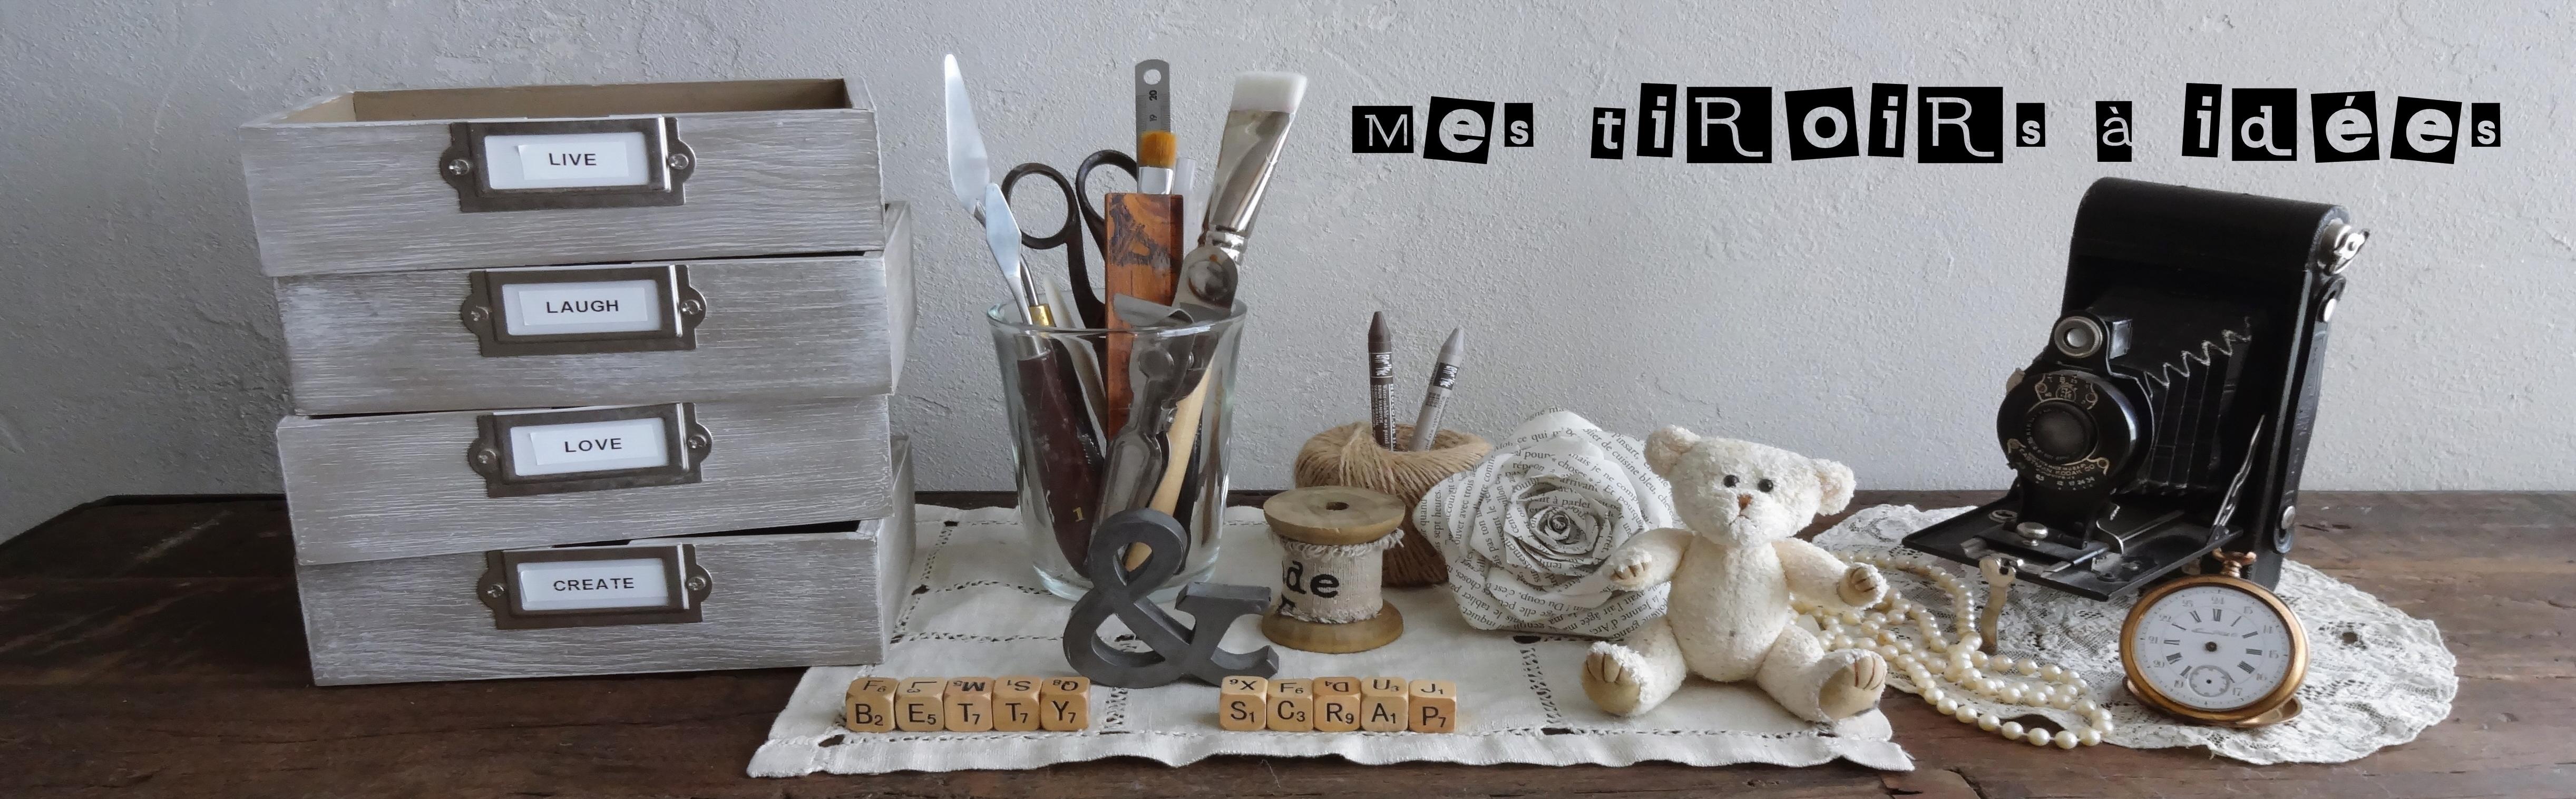 mes-tiroirs-à-idées